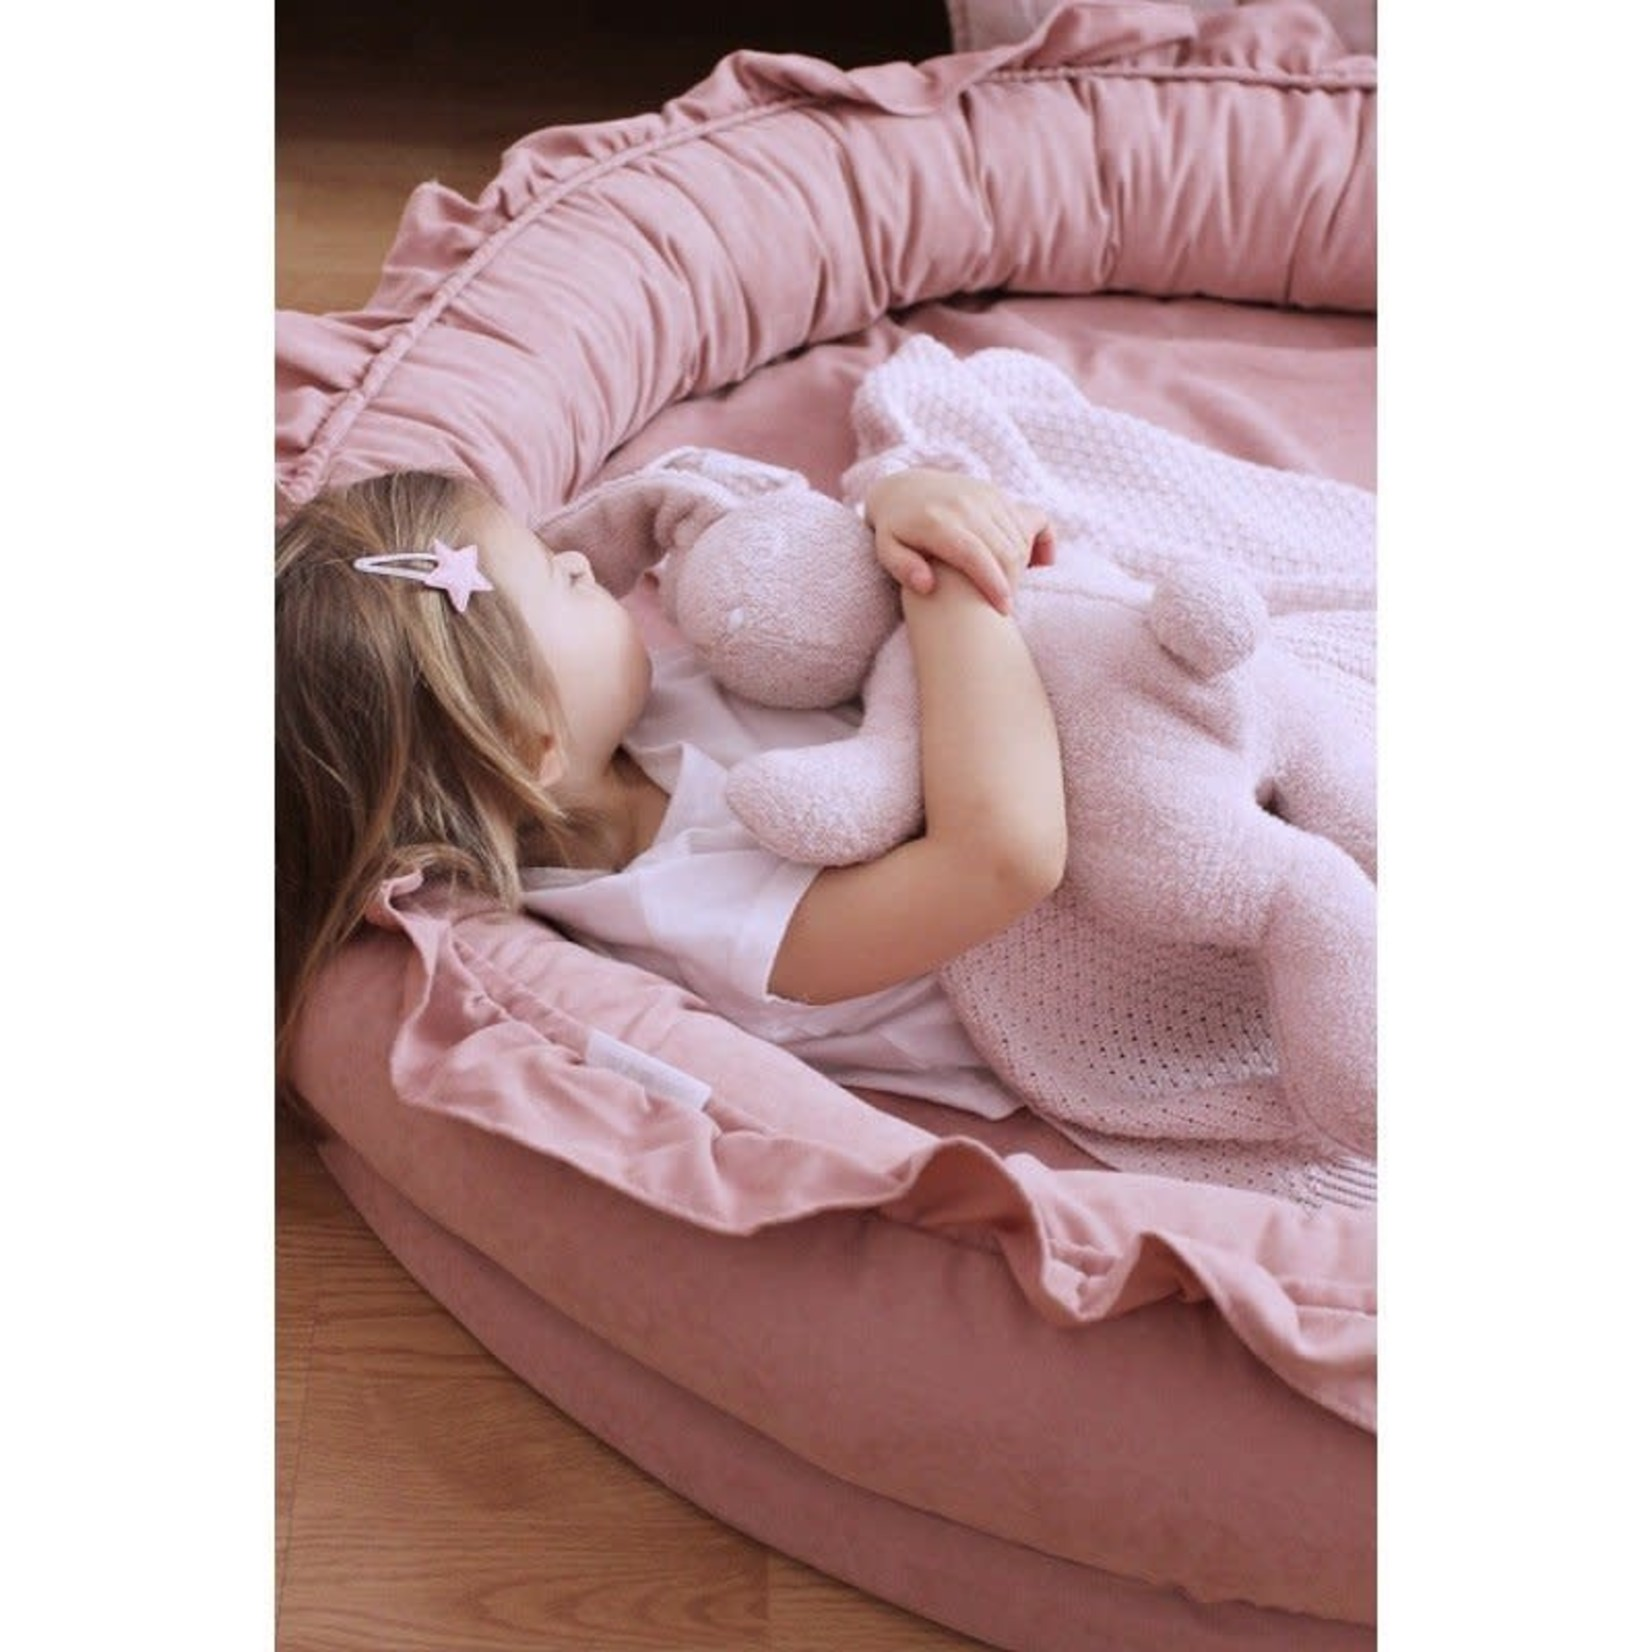 Cotton & Sweets Junior Nest - Blush